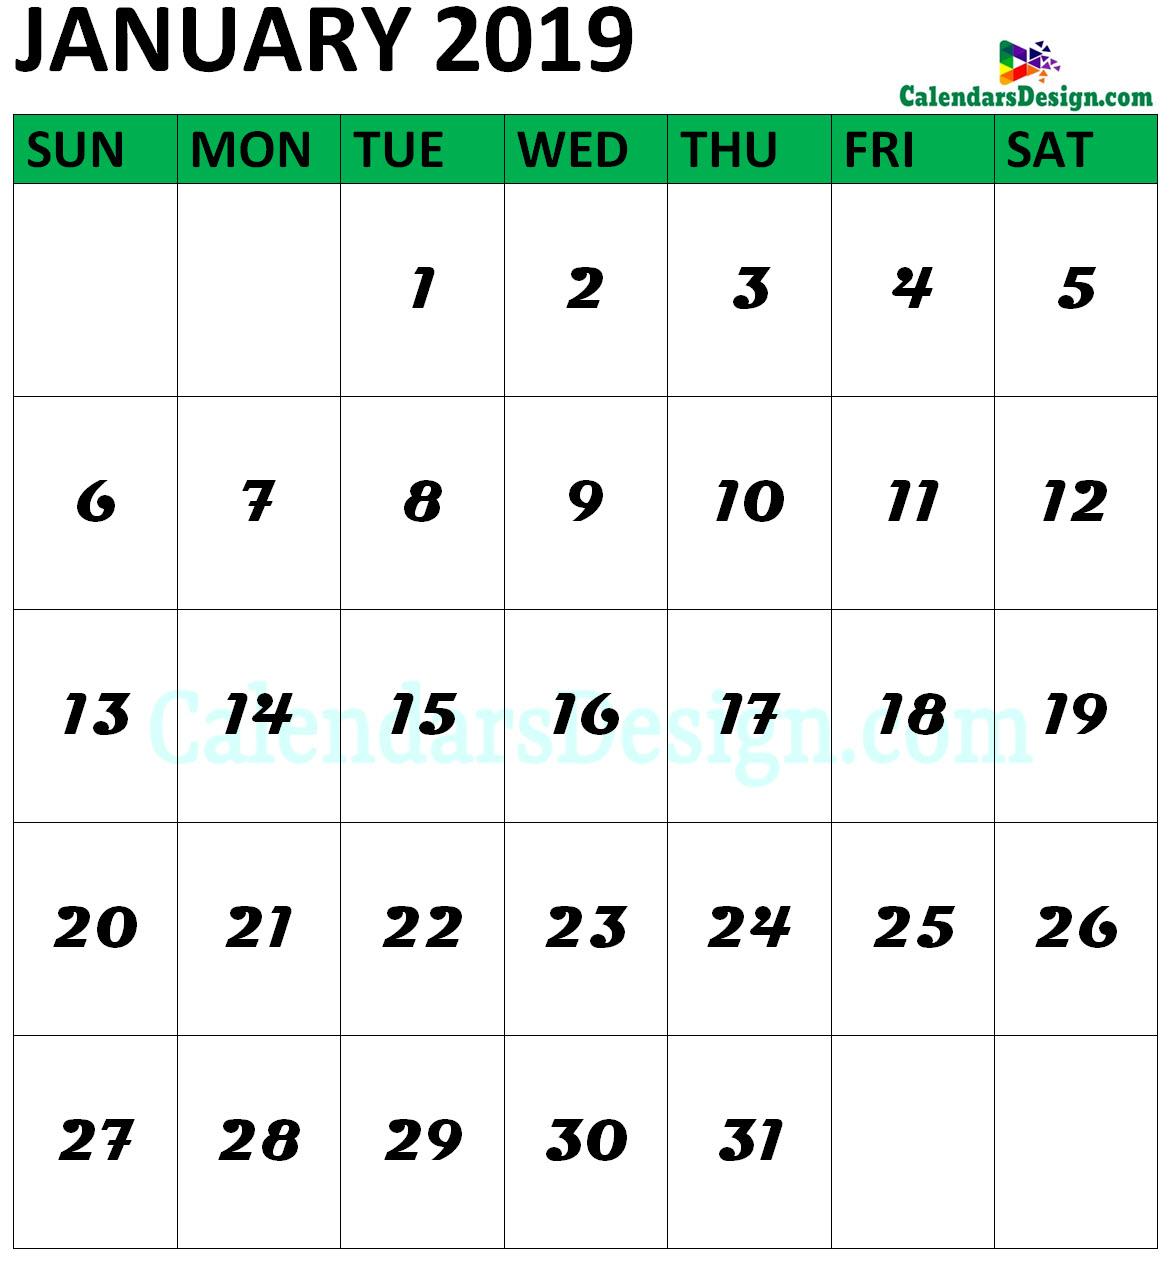 January 2019 Calendar Vertical